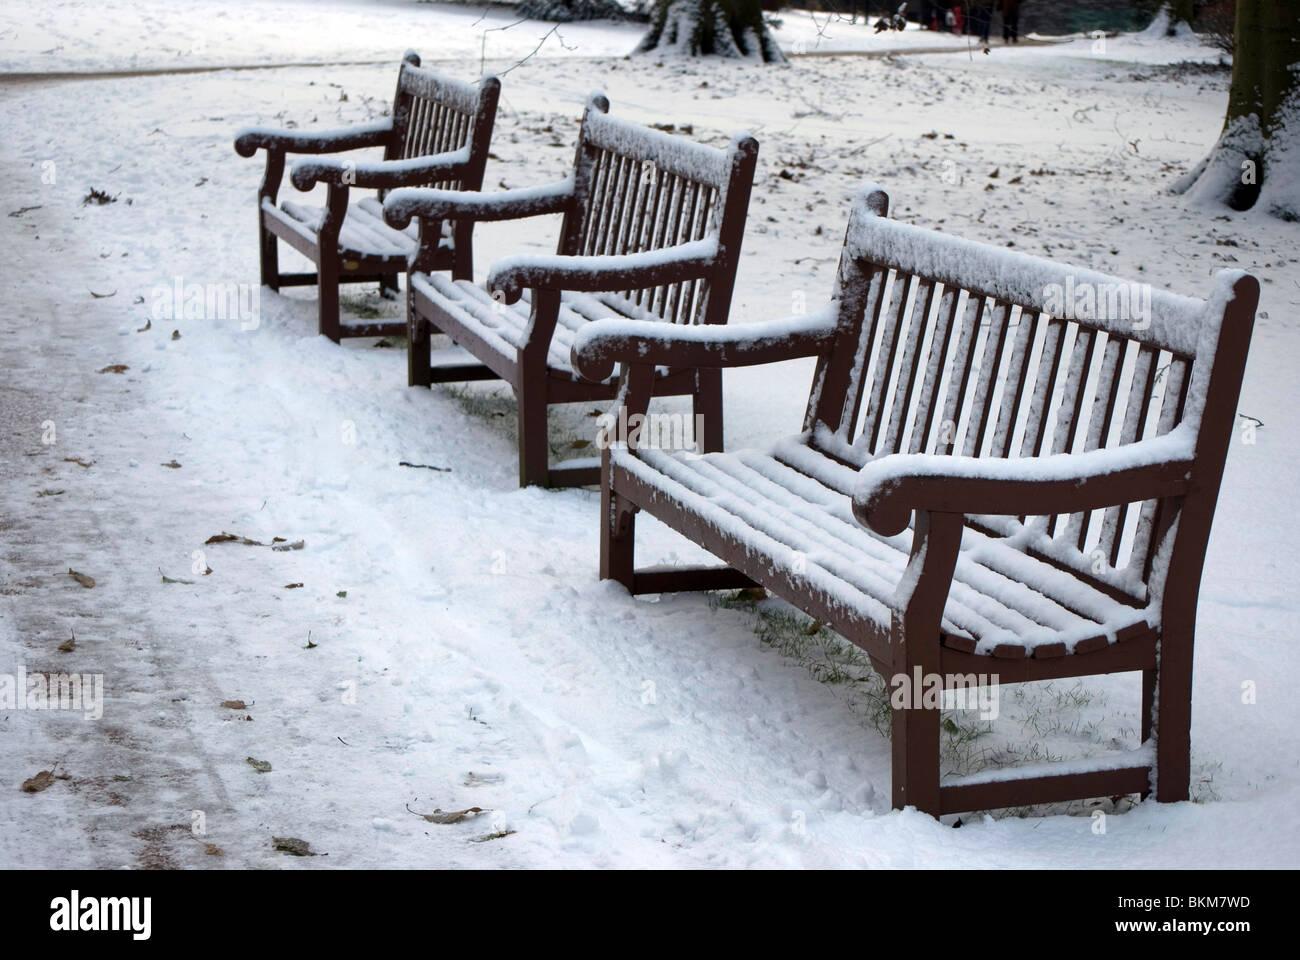 Seats (park benches) in the snow in the Royal Botanic Garden, Edinburgh, Scotland. - Stock Image